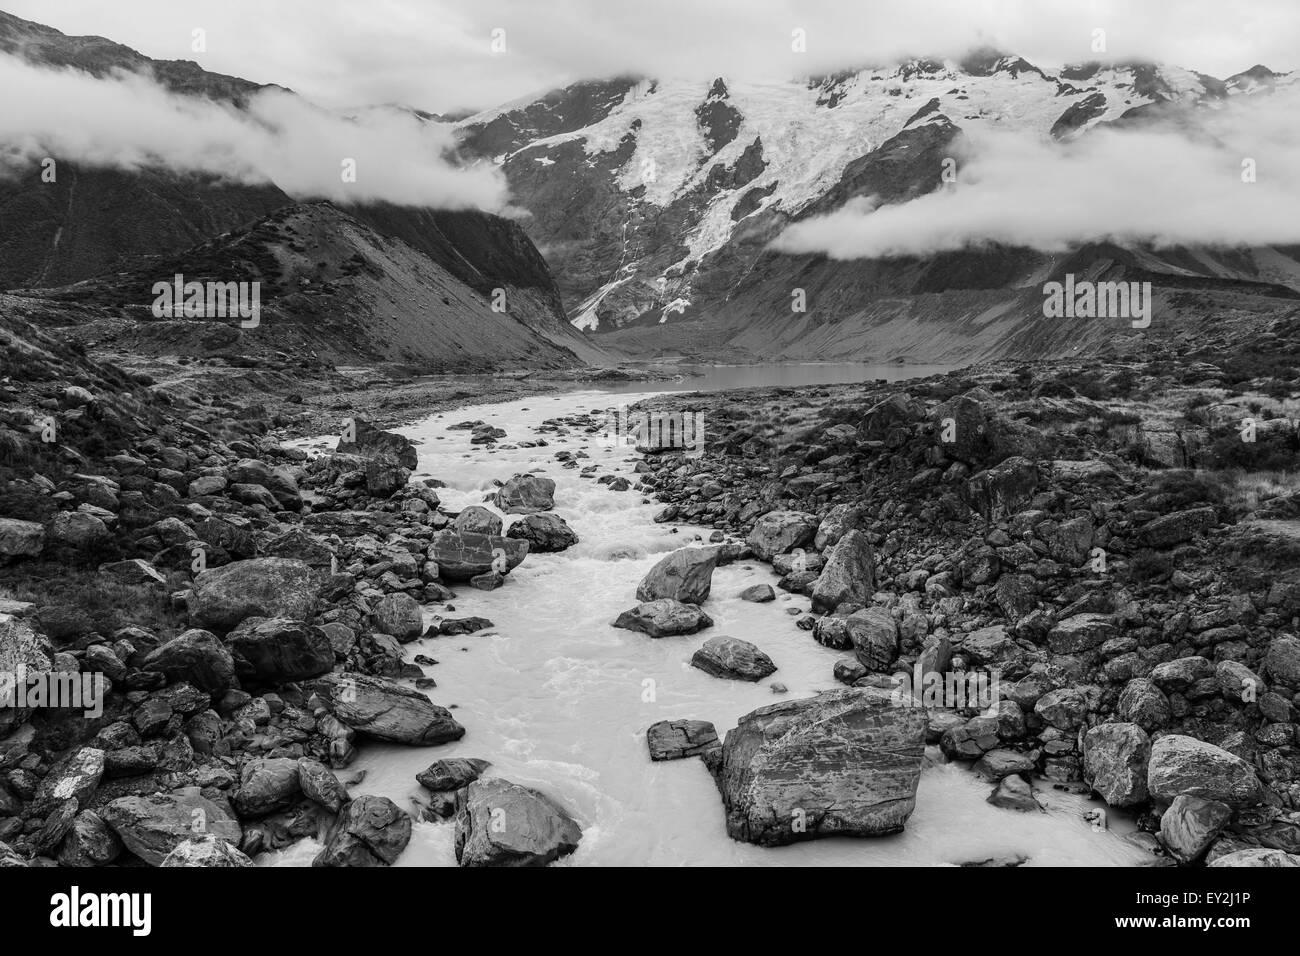 Impresionantes paisajes Imagen De Stock